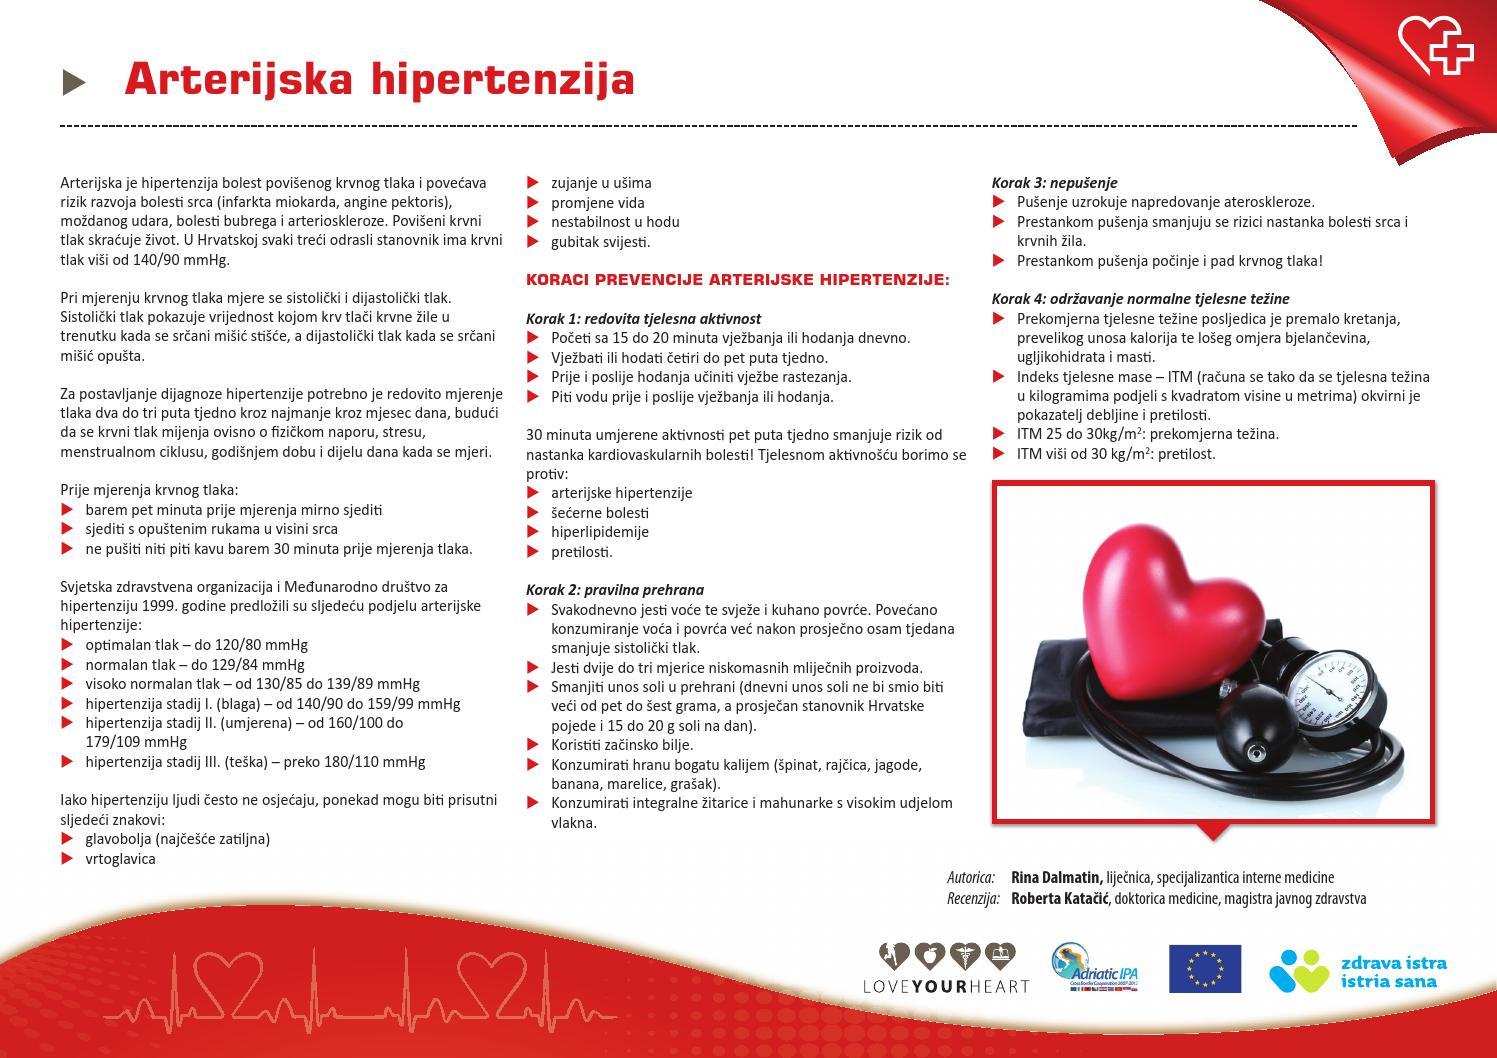 bezrazložna hipertenzija